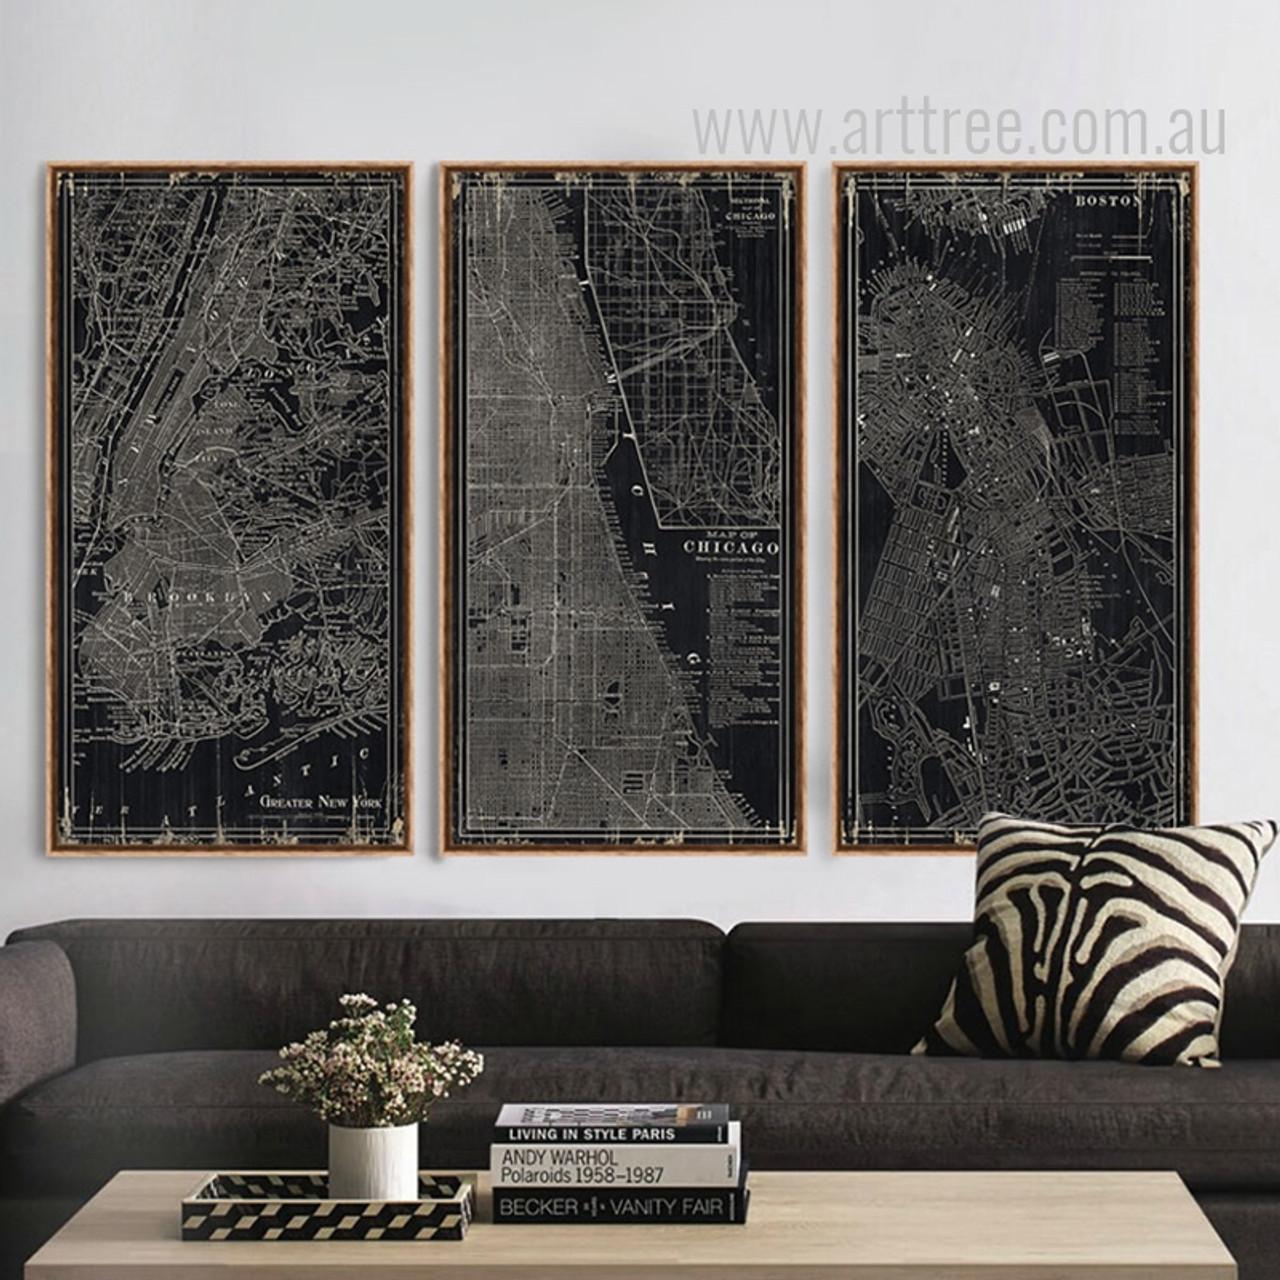 City Maps Set Arttree